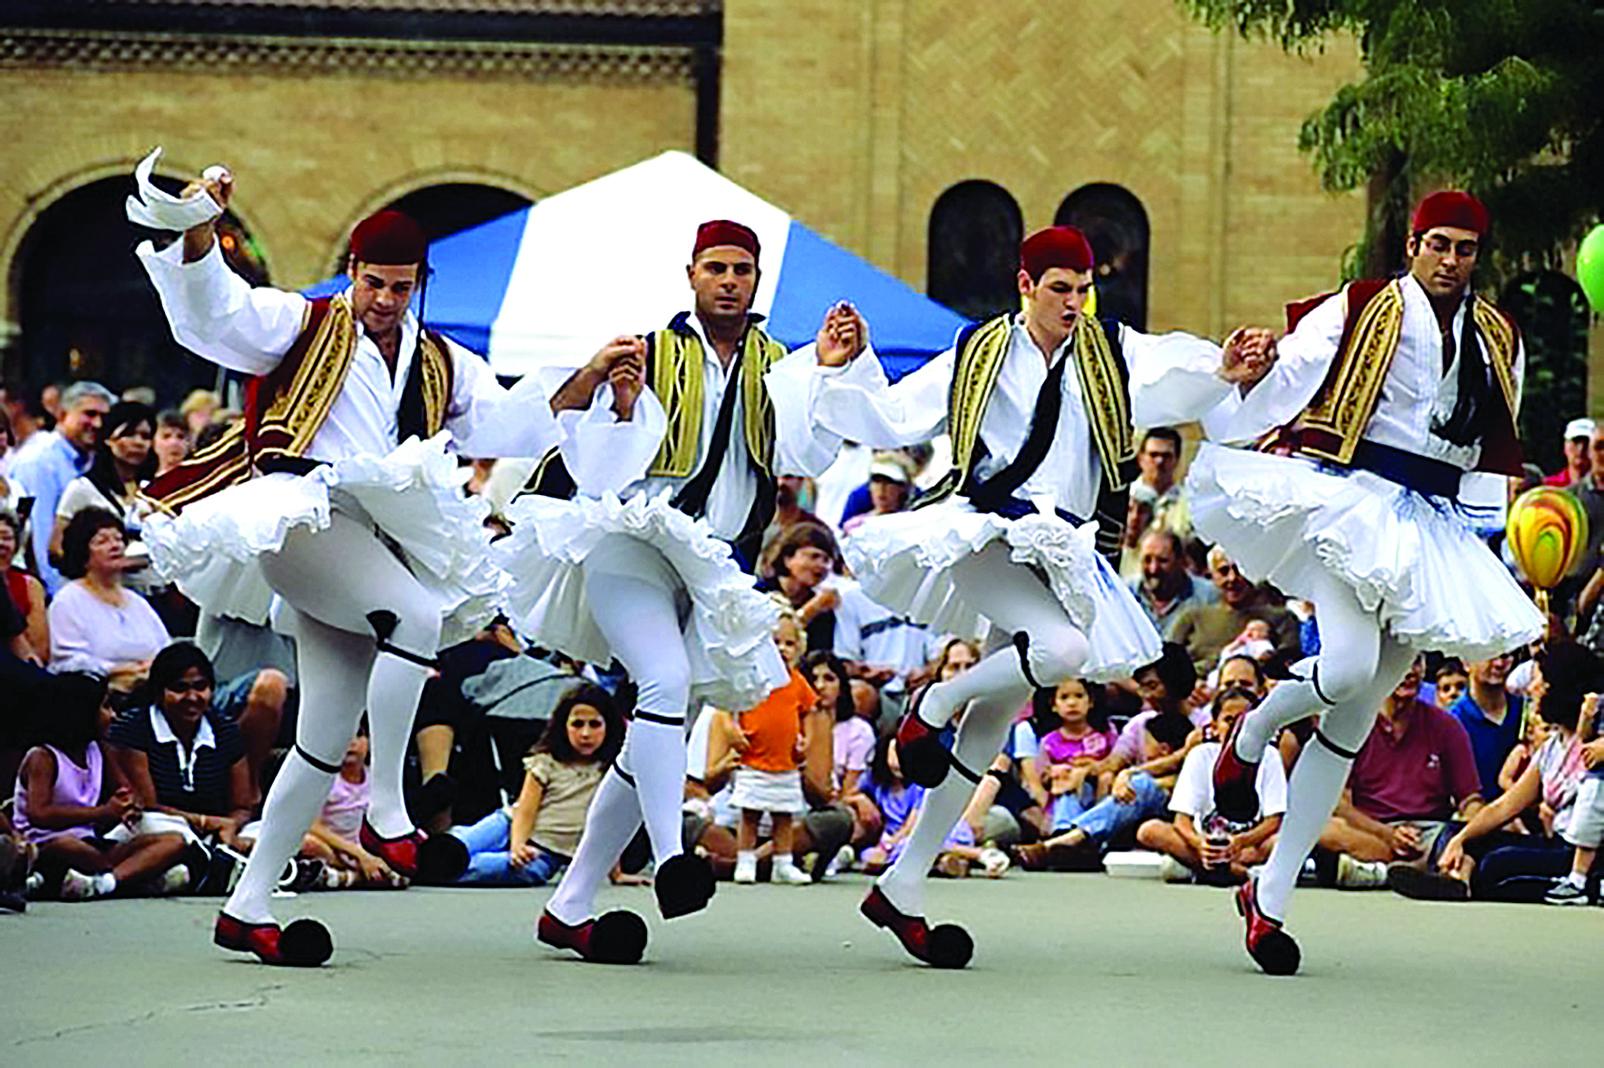 27th Annual Marietta Greek Festival